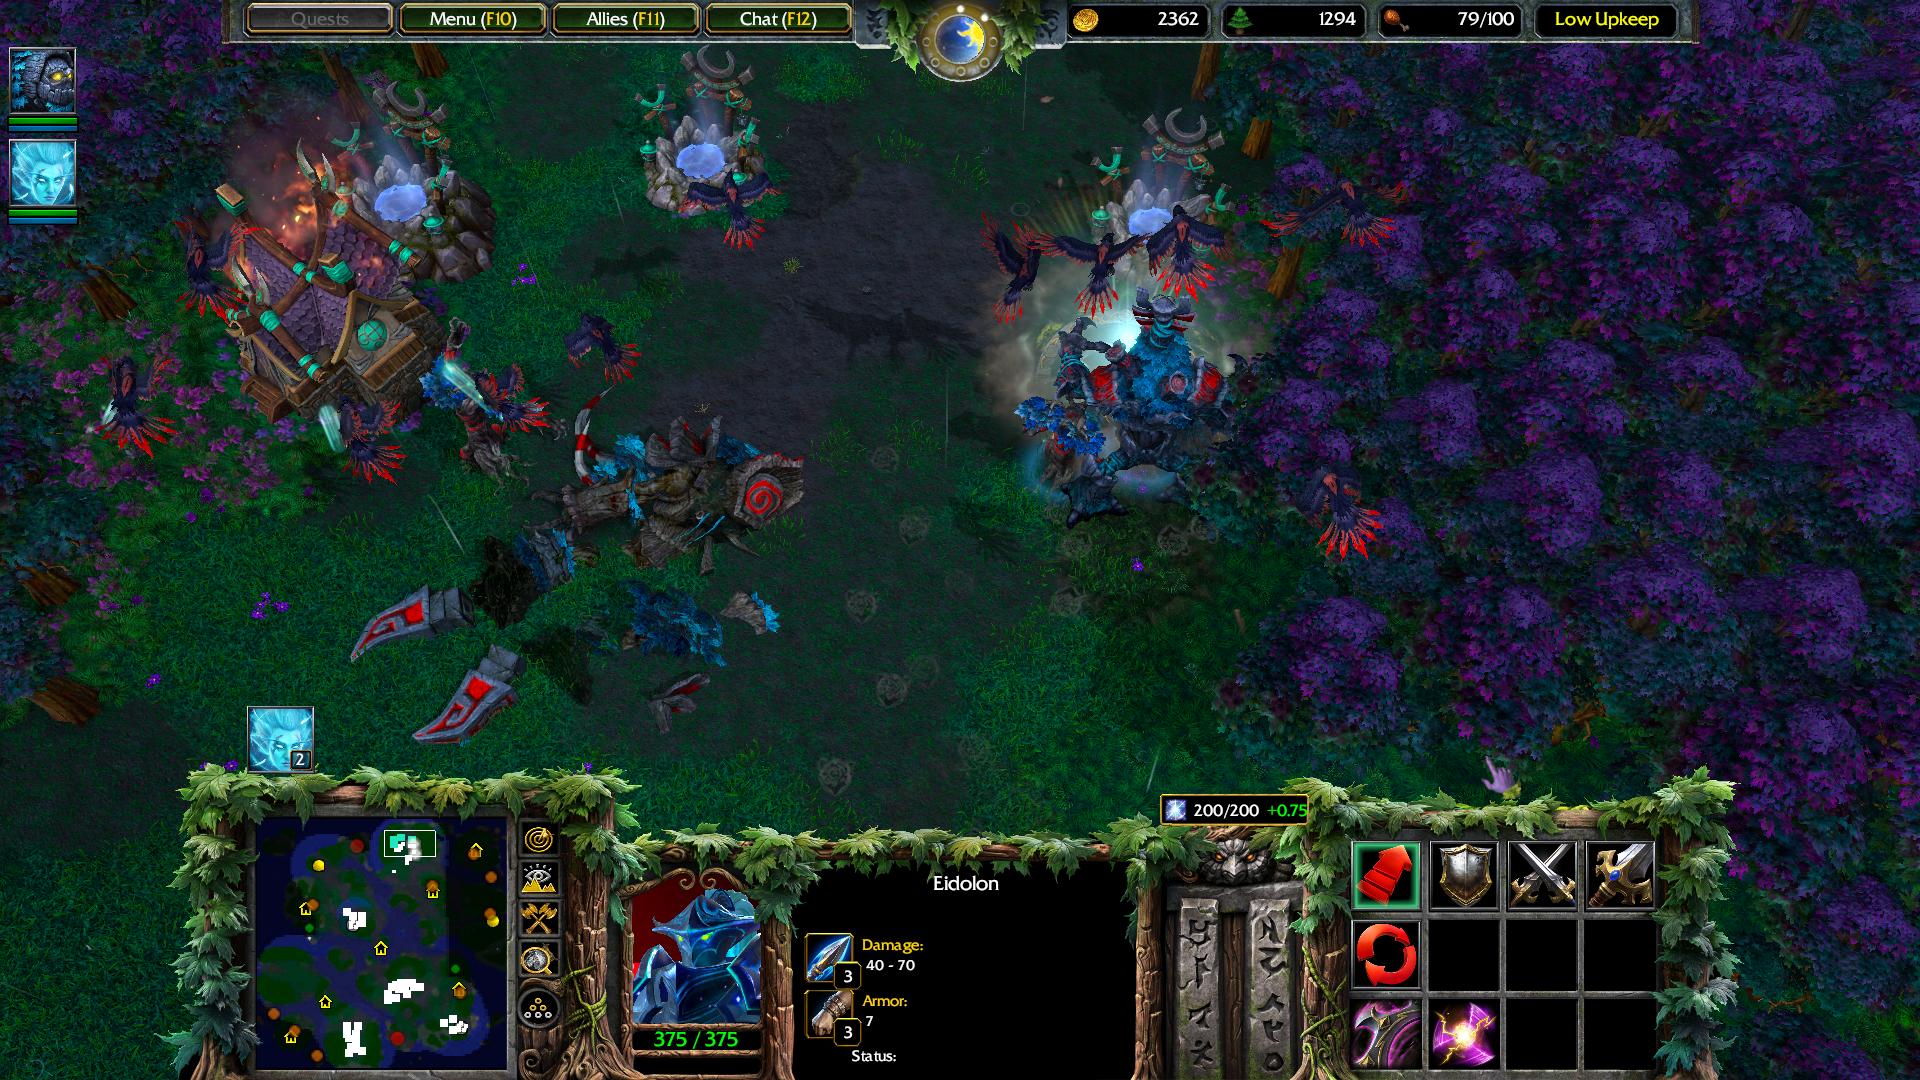 screenshot-4-png.354235